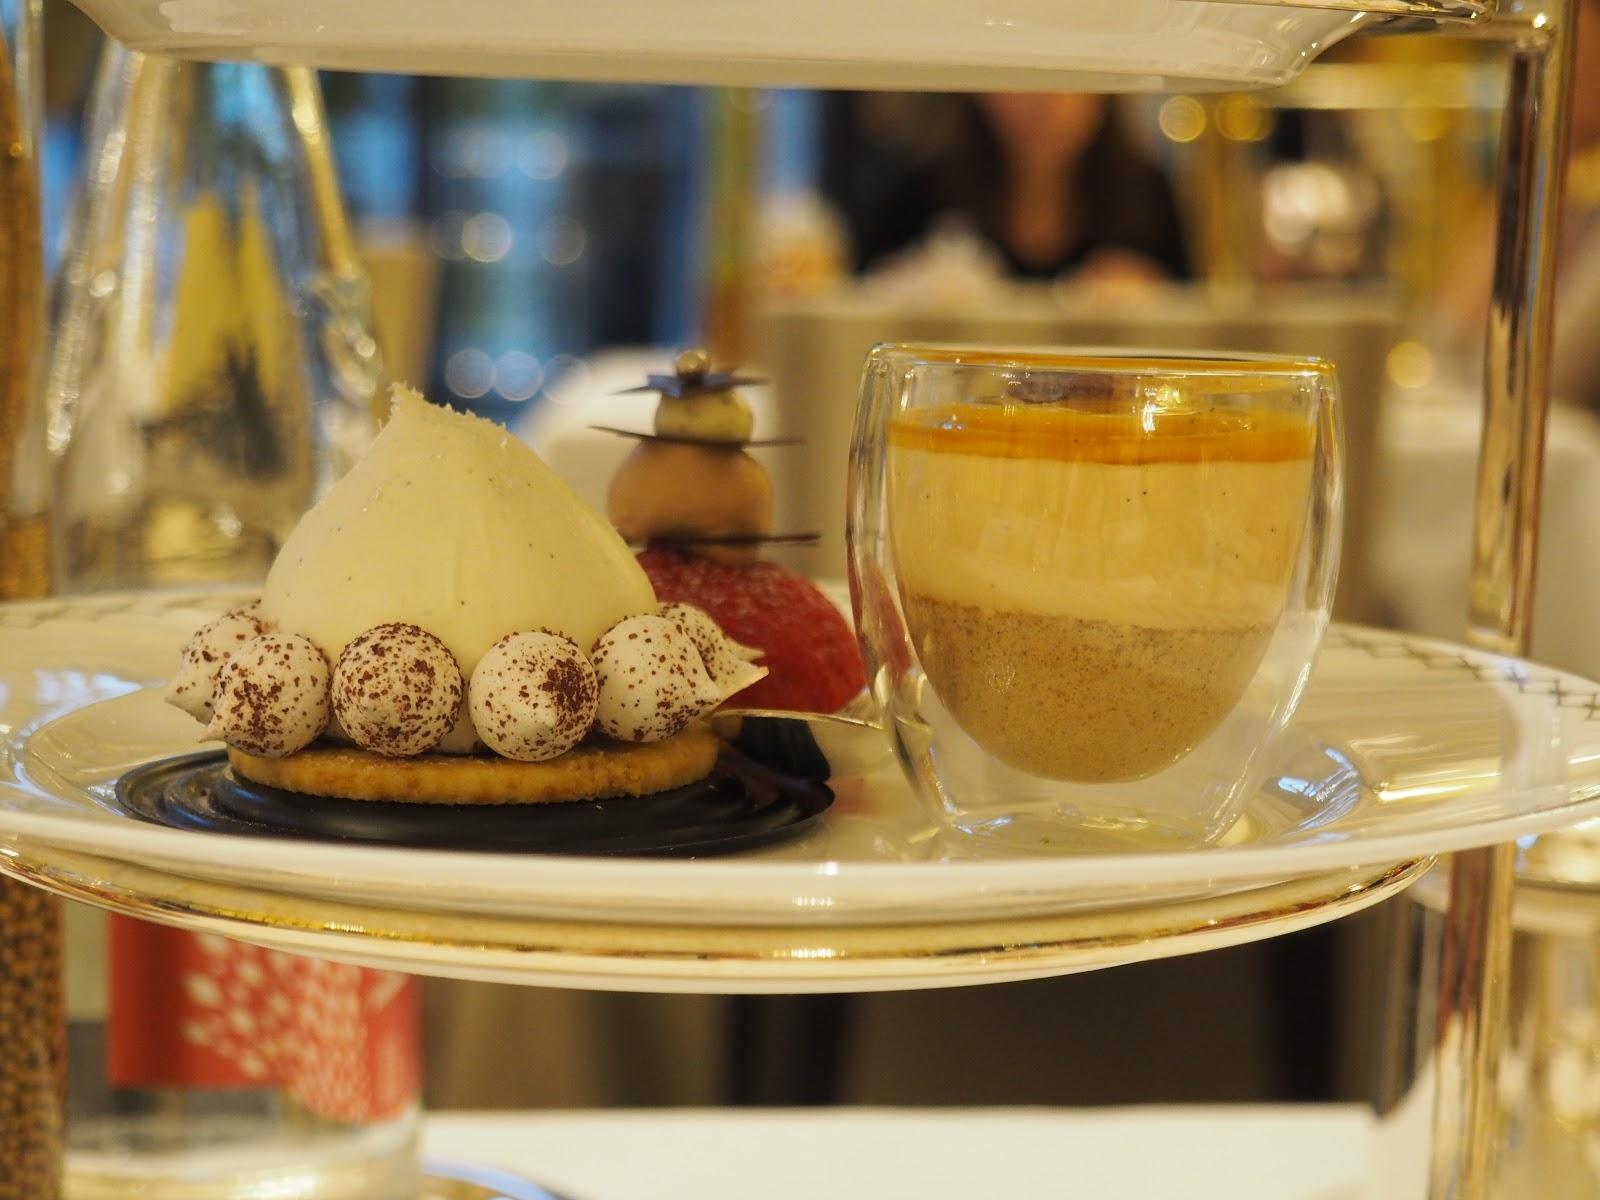 Peninsula Hotel, Paris, Afternoon Tea, cakes